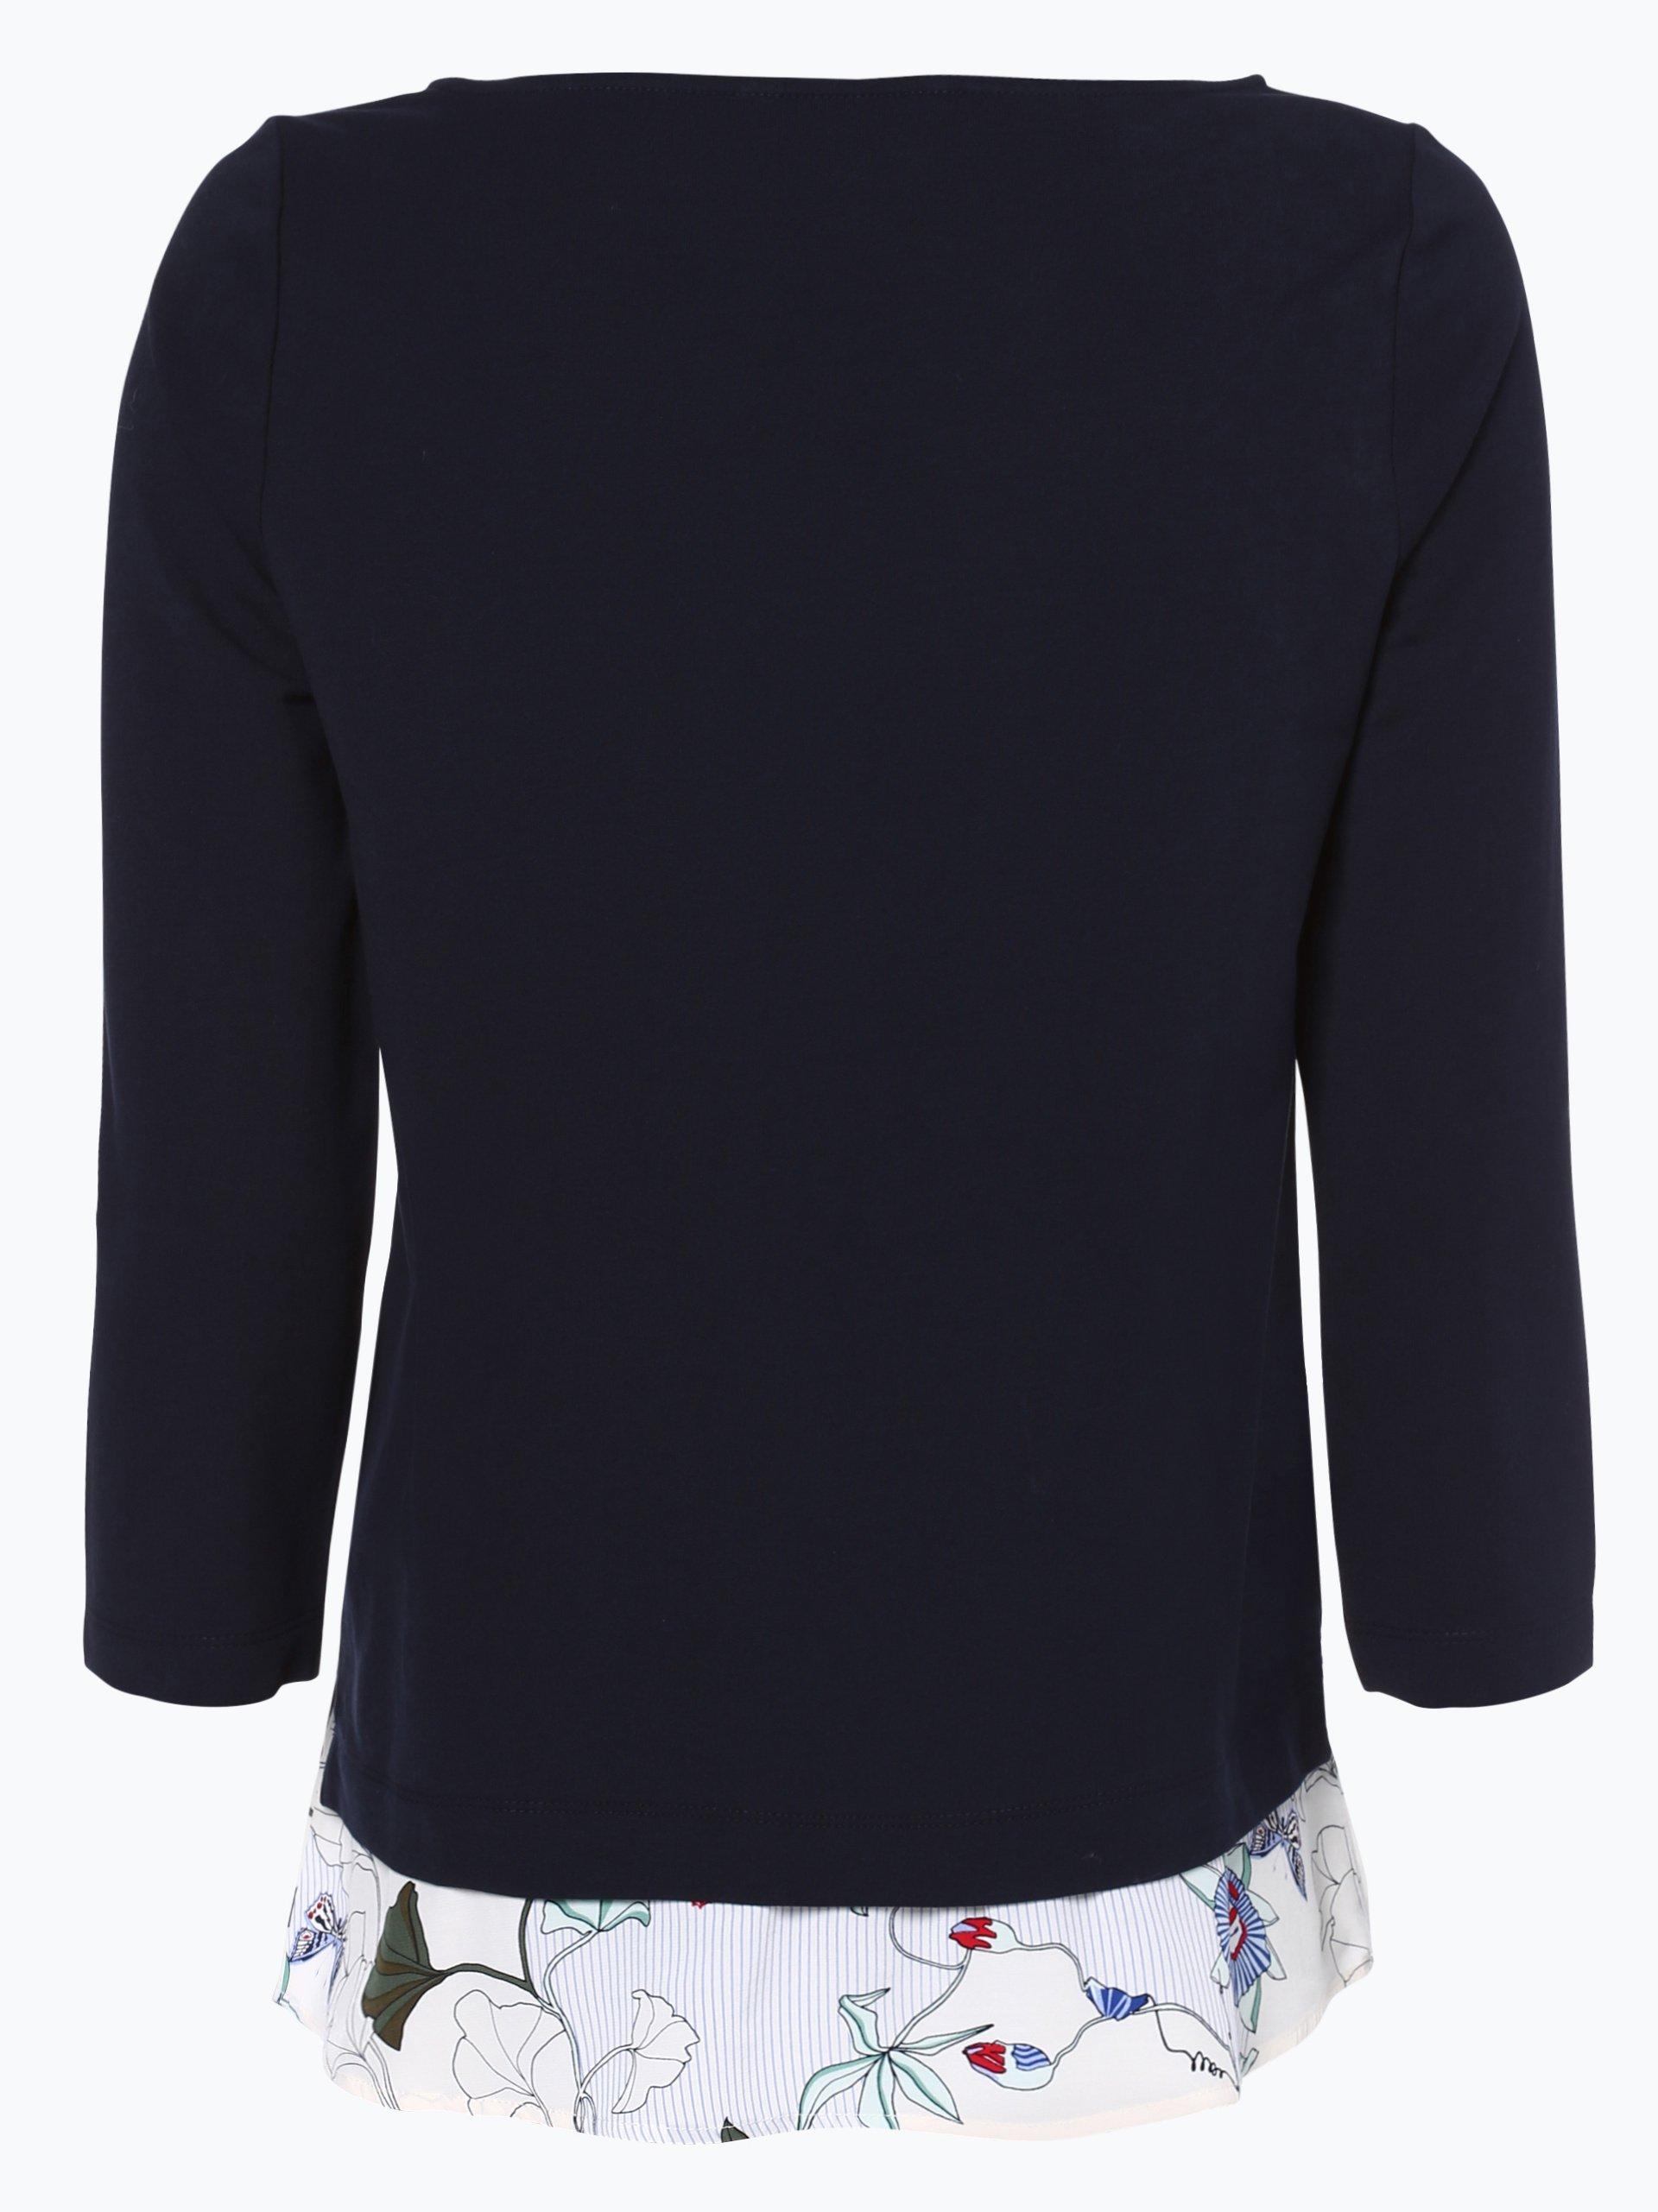 tommy hilfiger damen sweatshirt marine gemustert online. Black Bedroom Furniture Sets. Home Design Ideas